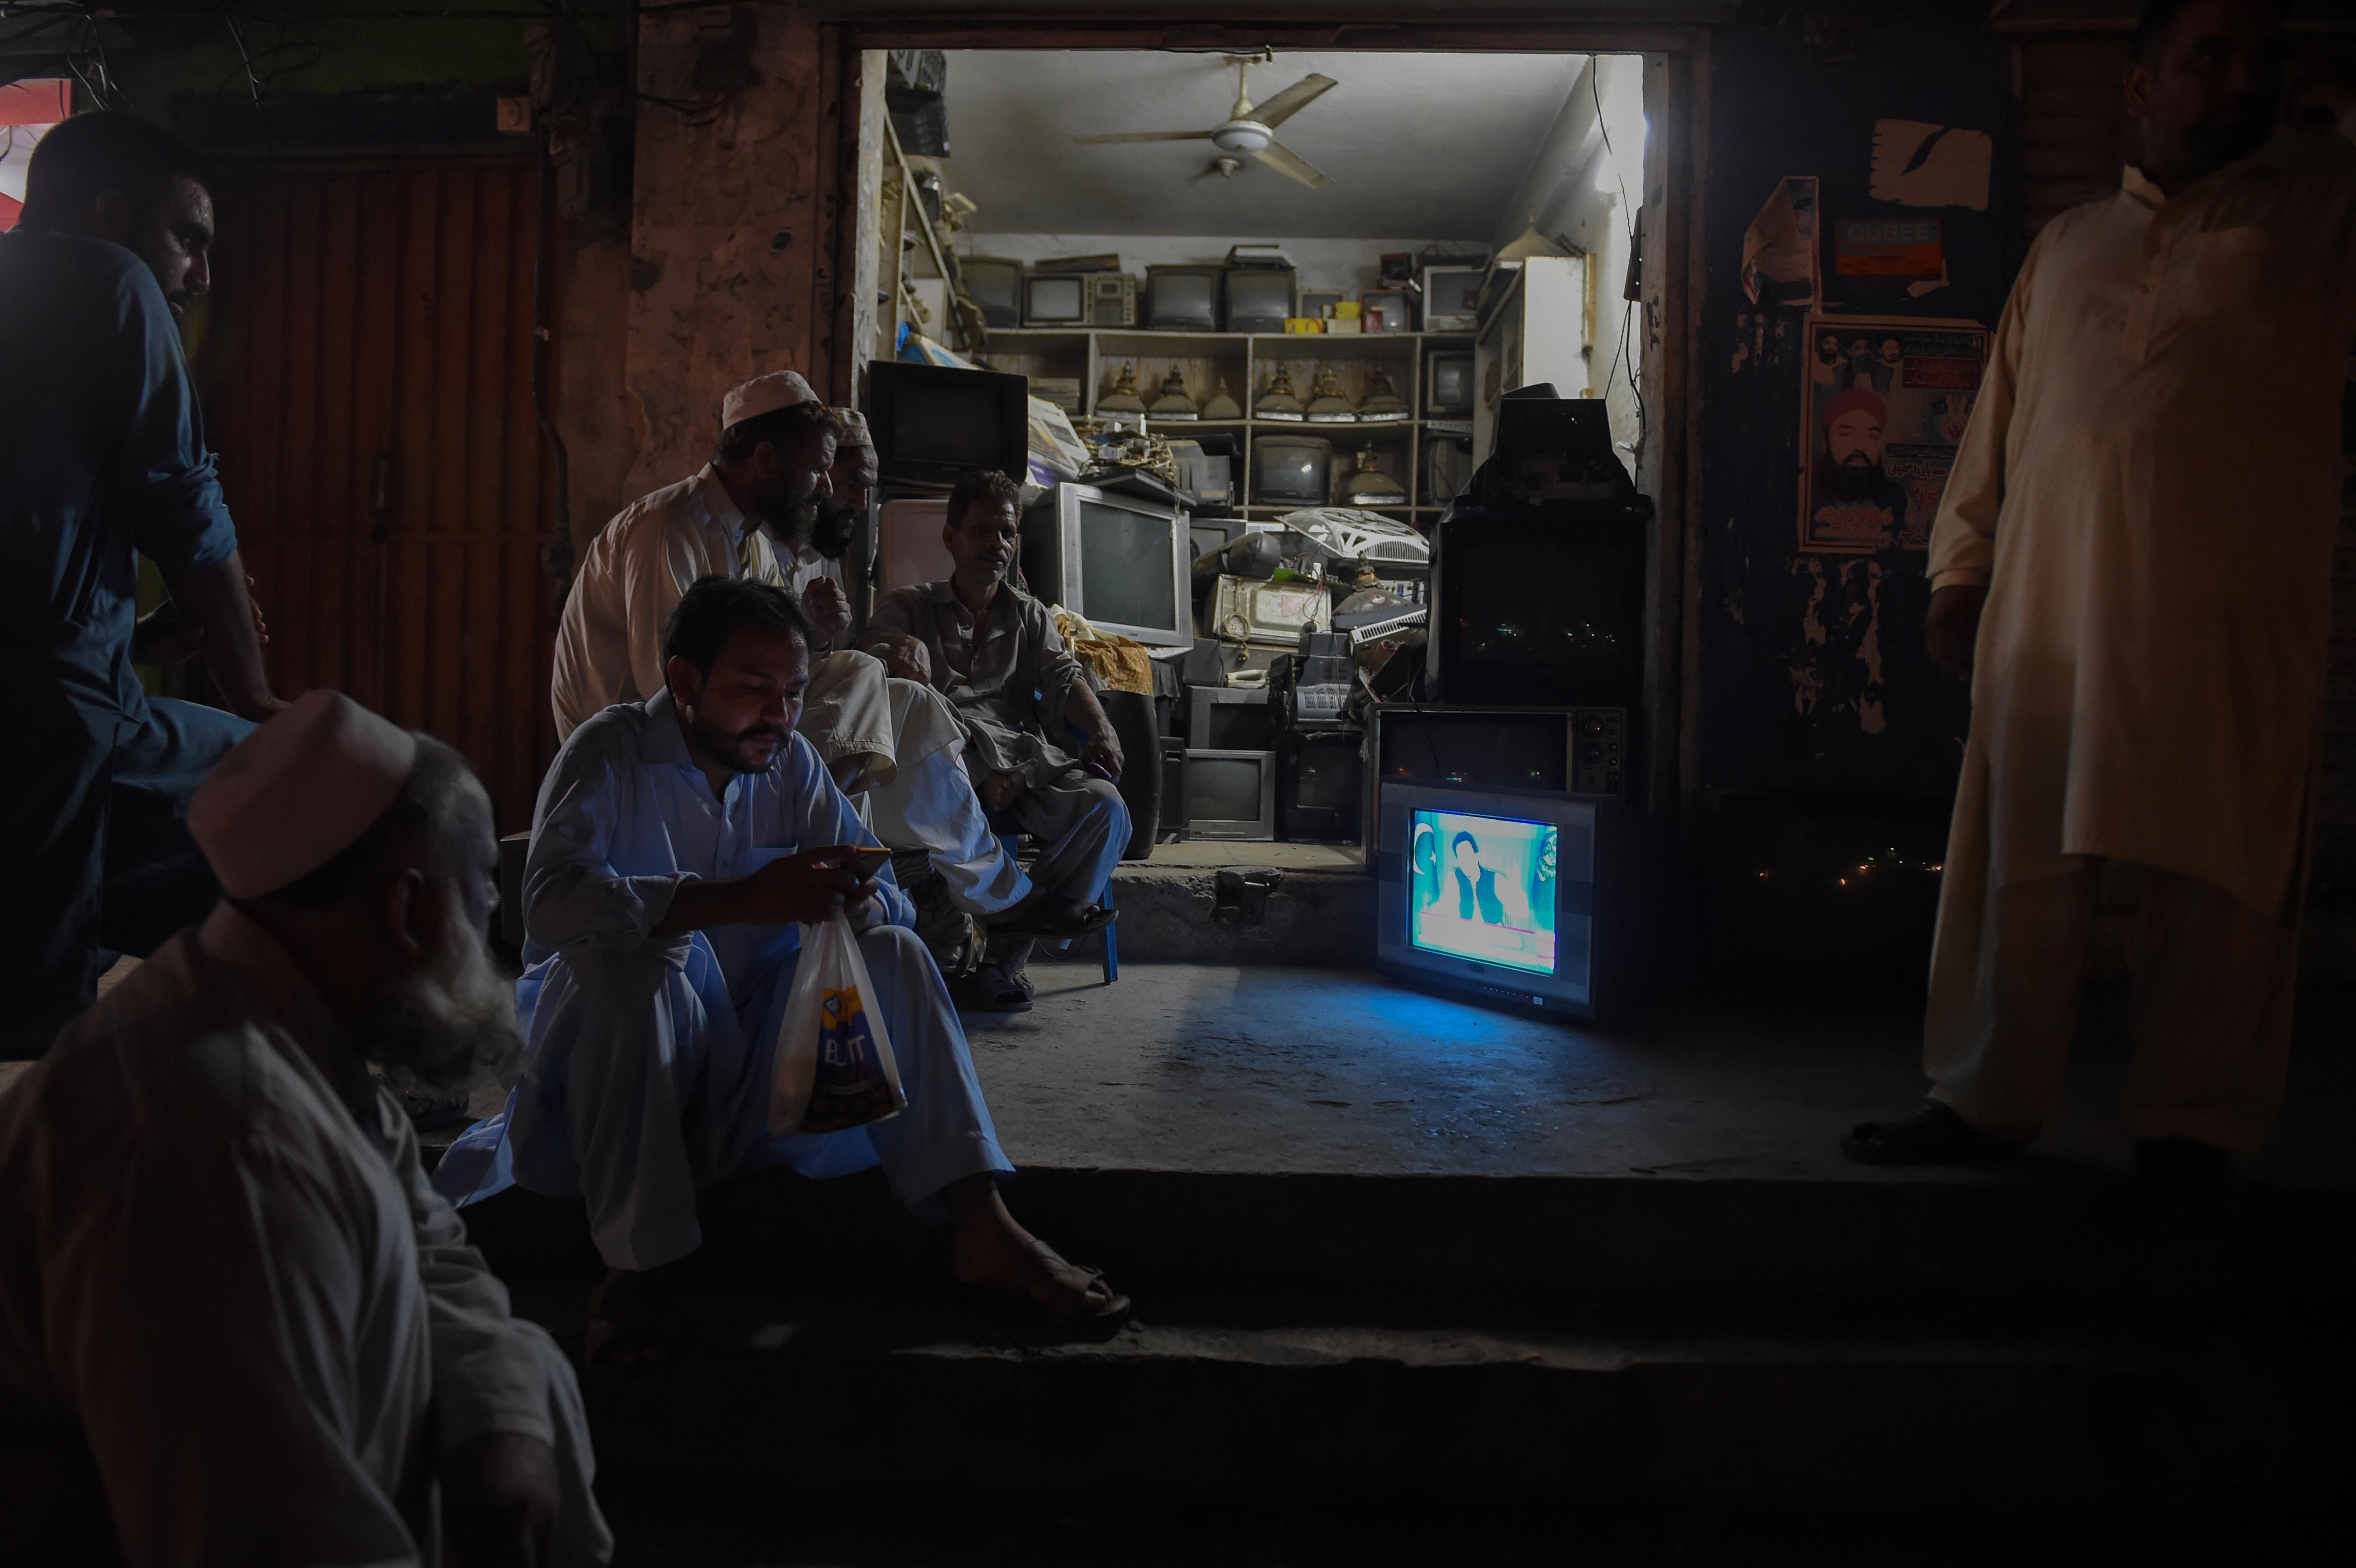 Khan highlights development, corruption fight in 1st speech as prime minister